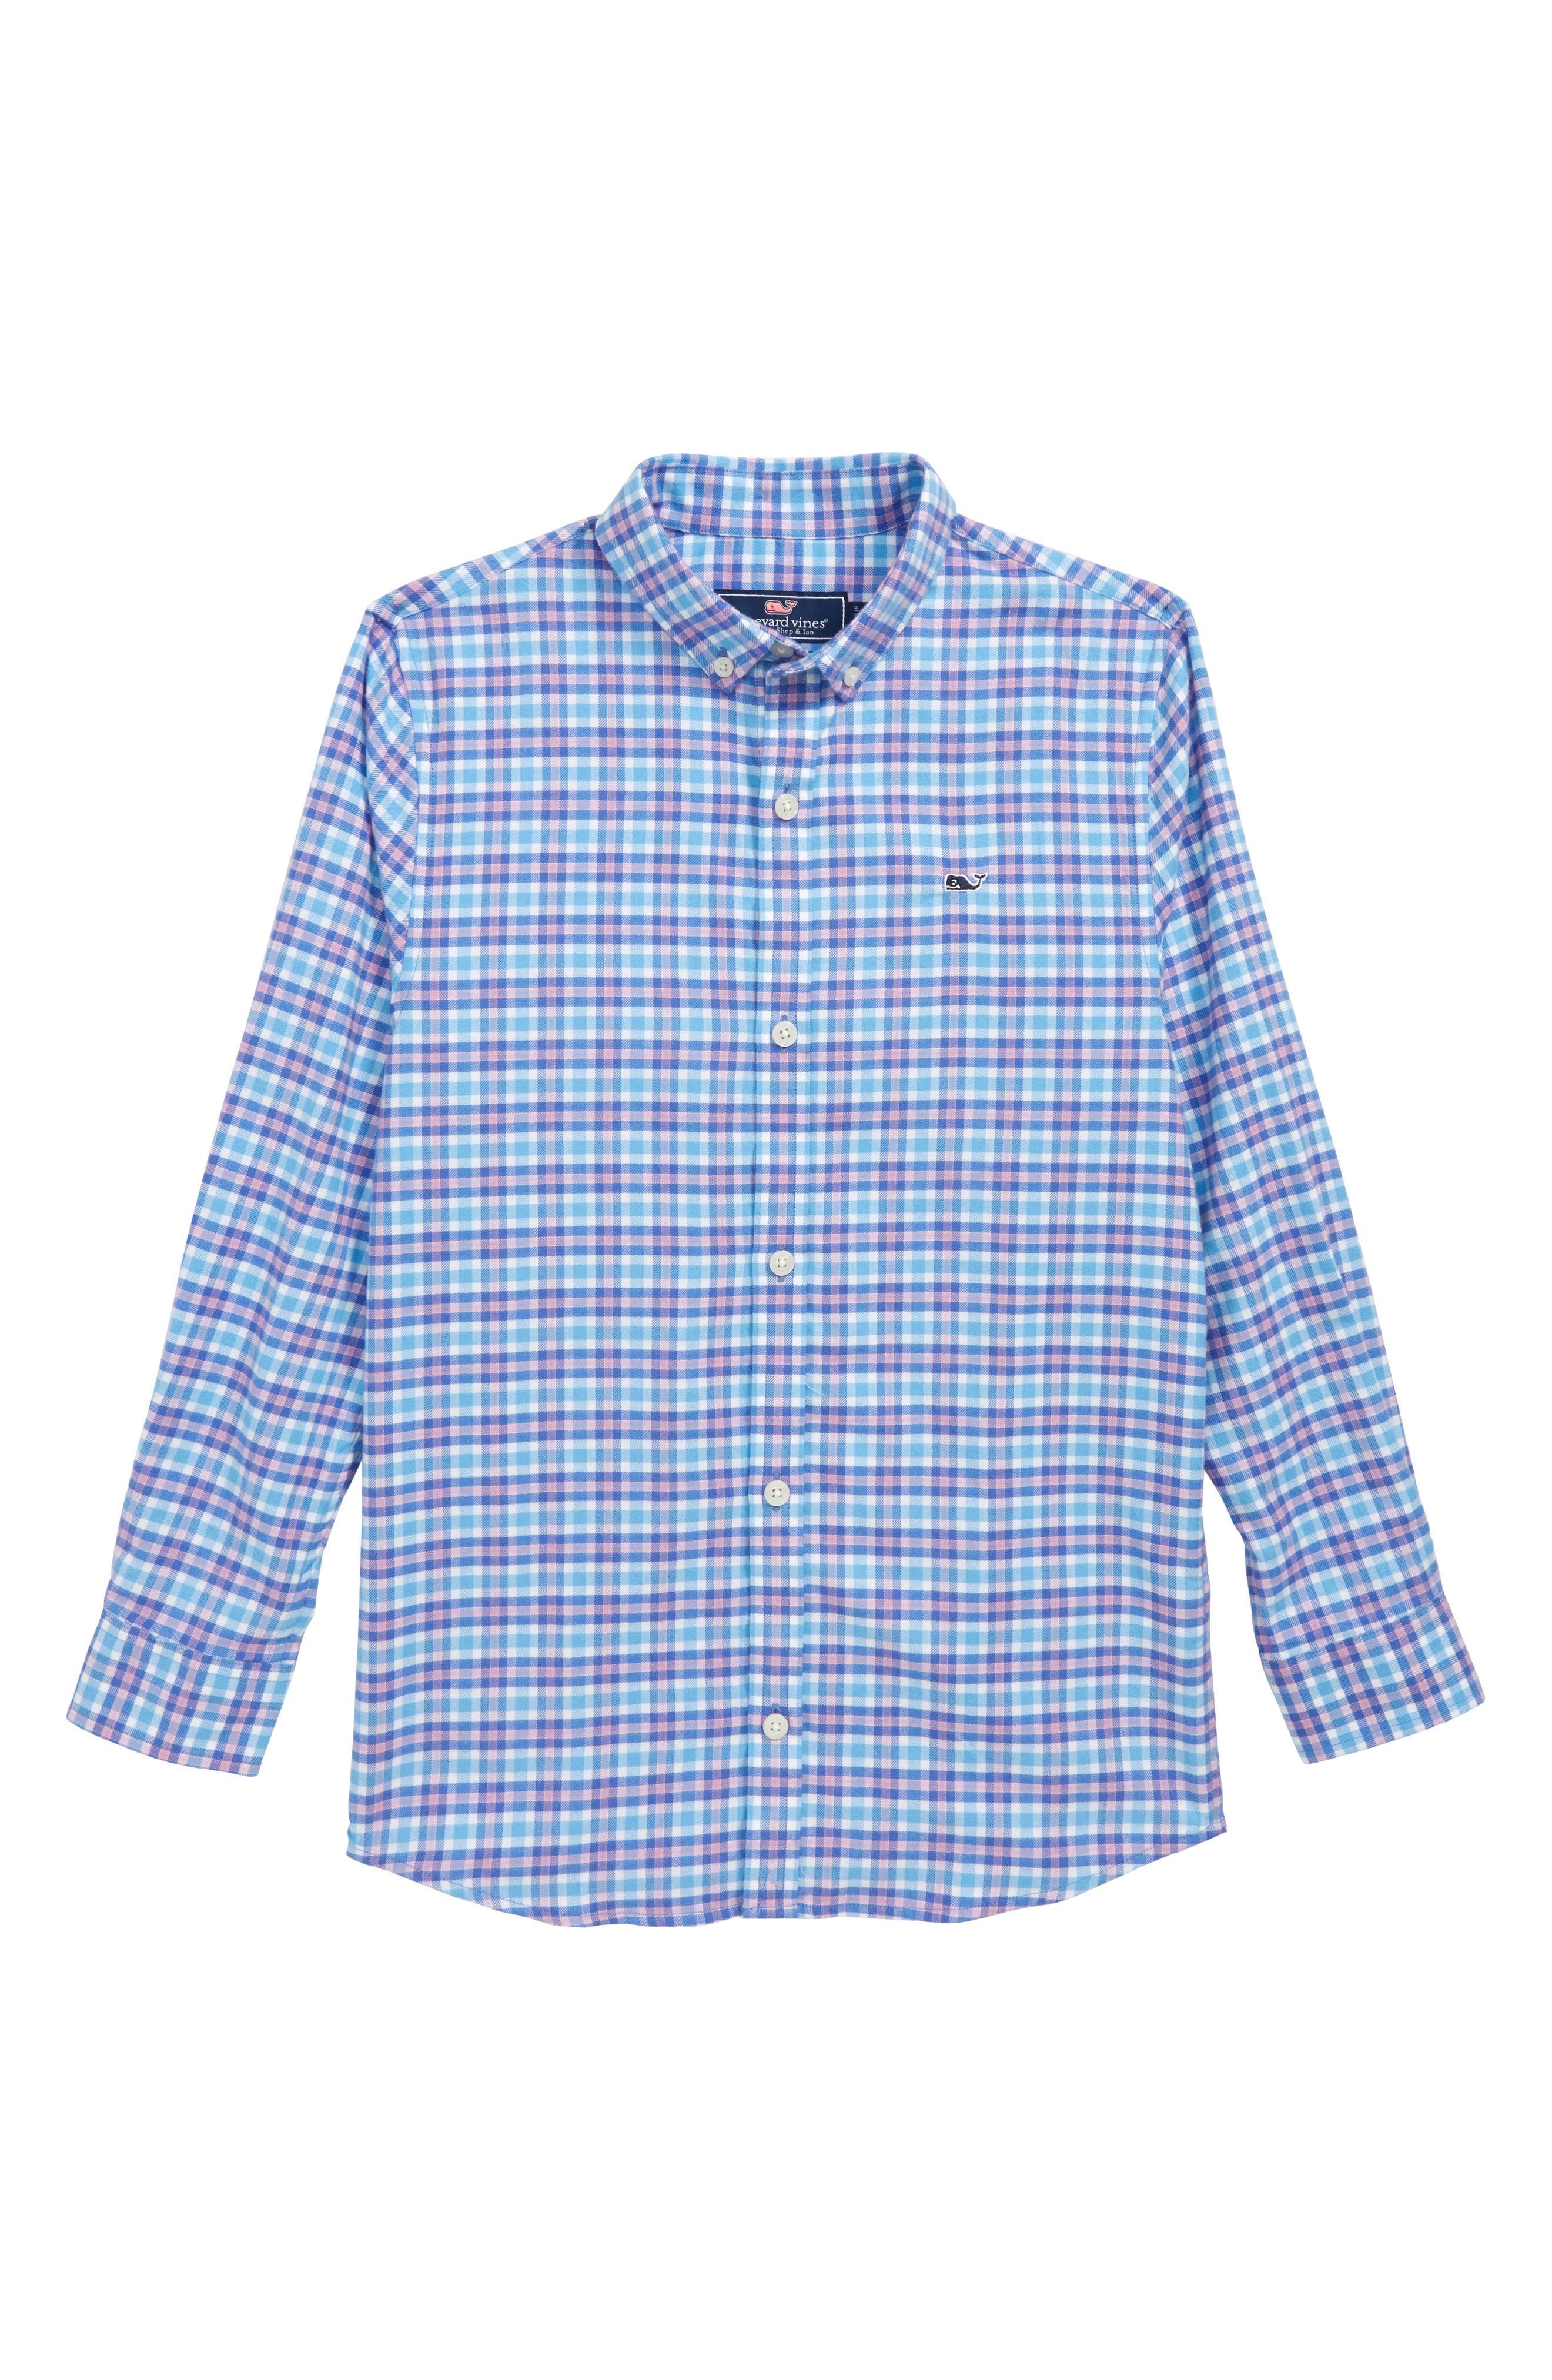 Morgan Way Flannel Whale Shirt,                         Main,                         color, 484